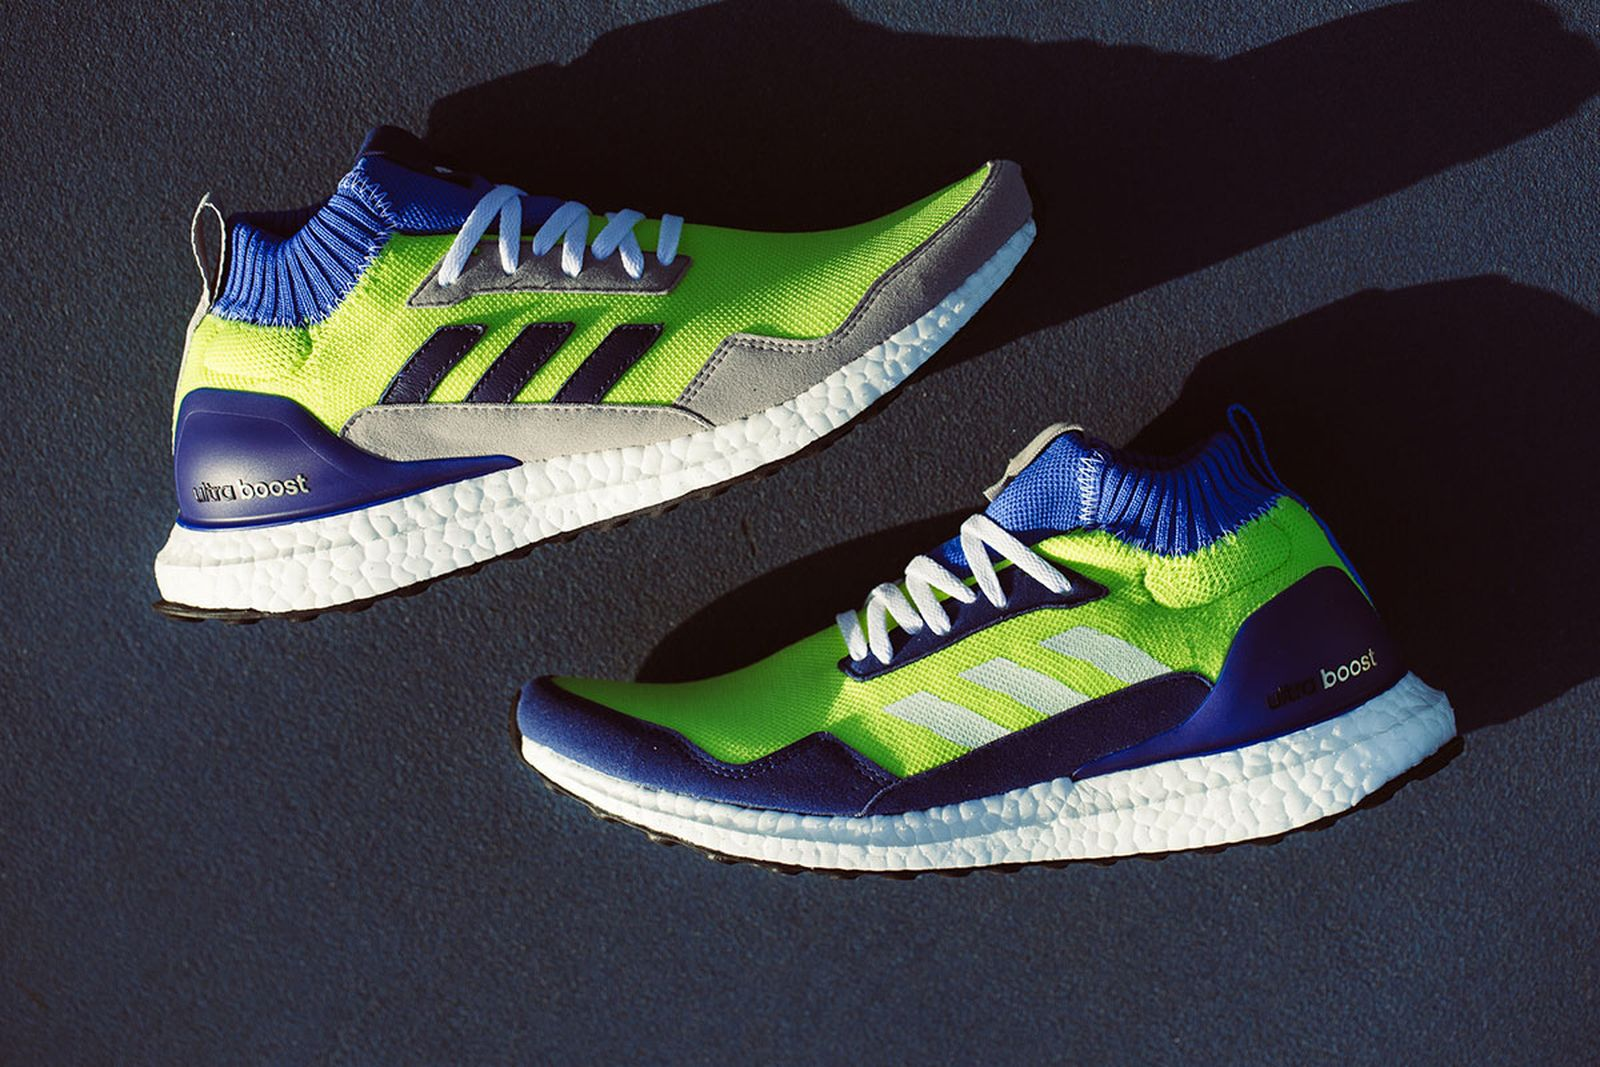 adidas-consortium-ultraboost-mid-prototype-release-date-price-03